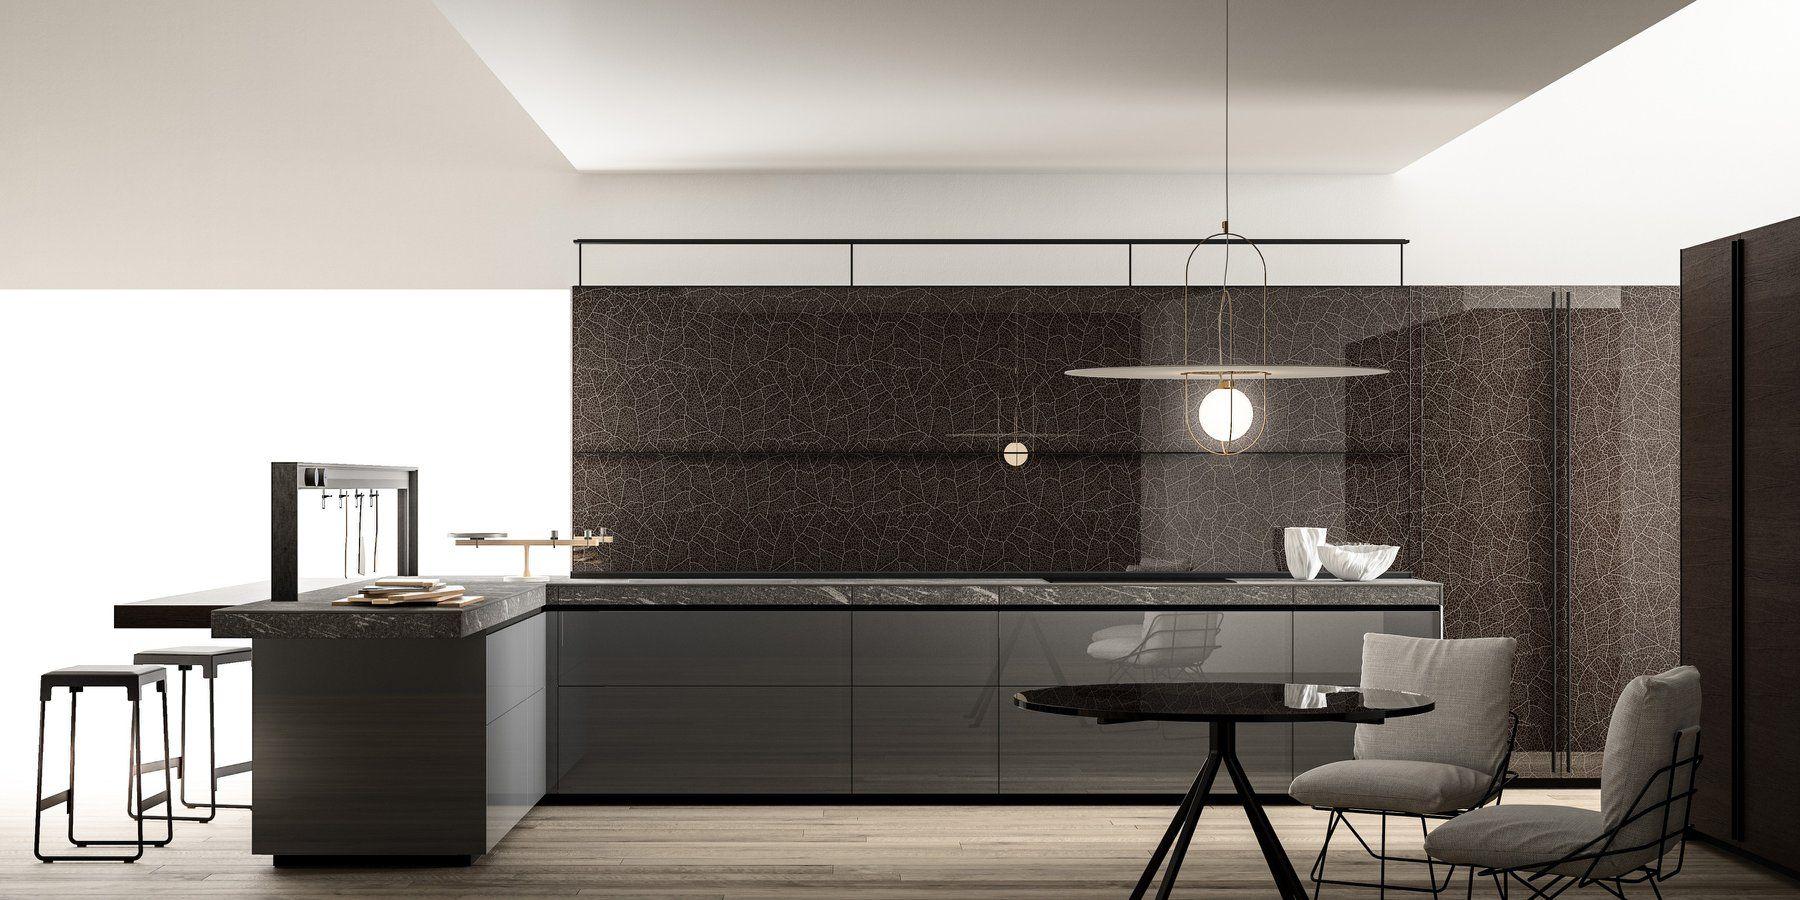 Valcucine kitchen Artematica Vitrum| VITRUM GRAFICO | Designer ...